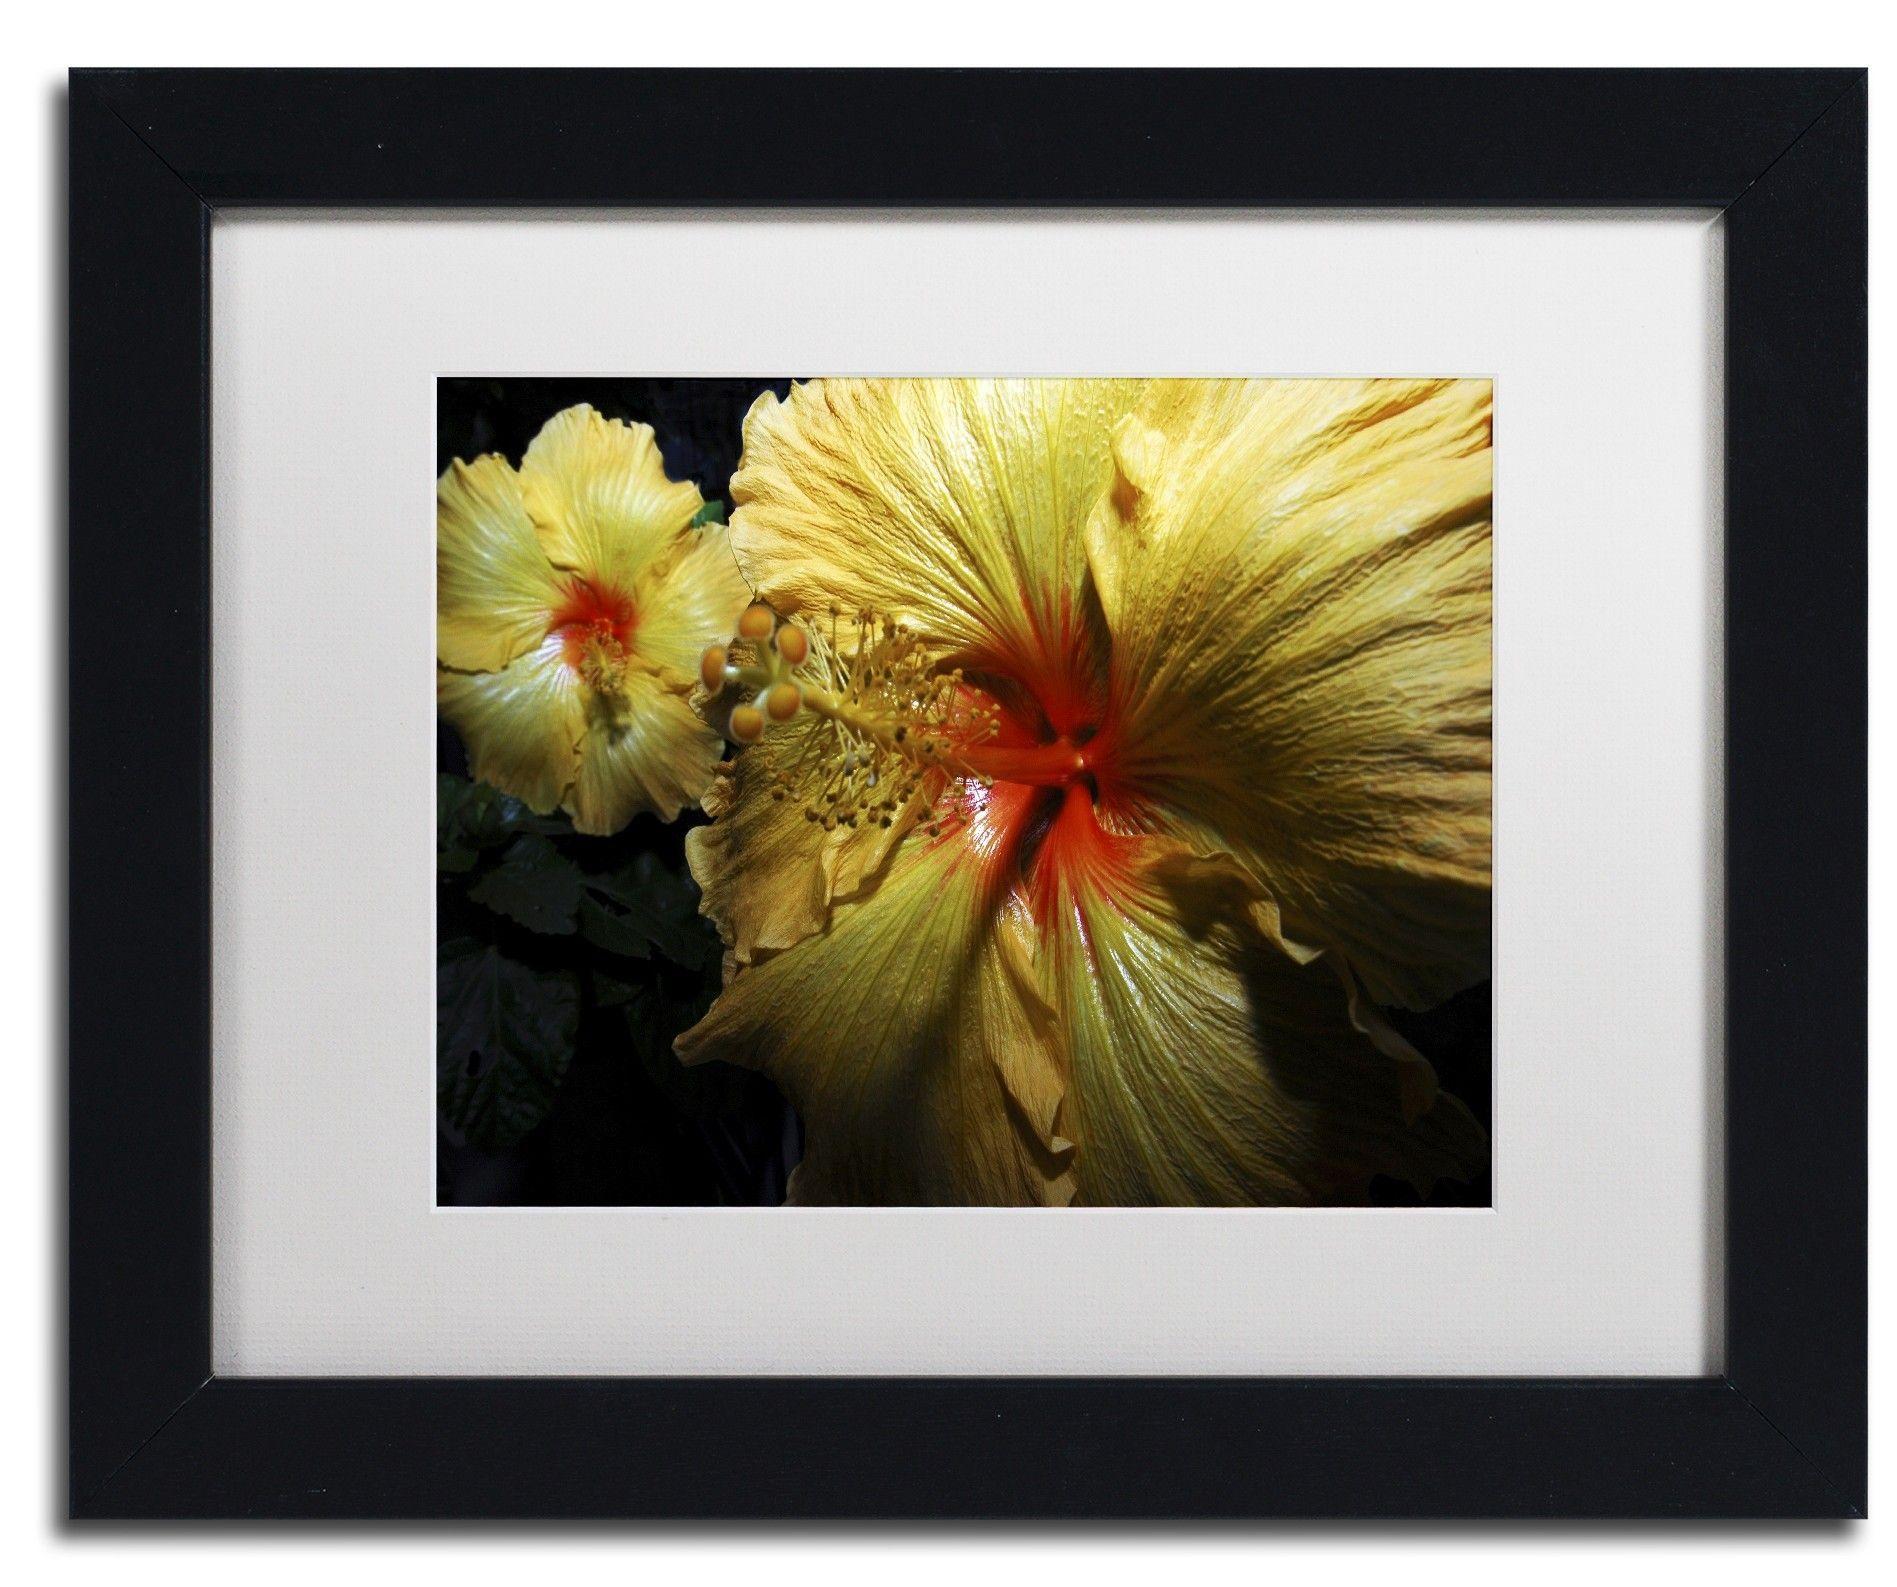 Sunburst Hibiscus by Kurt Shaffer Framed Photographic Print ...